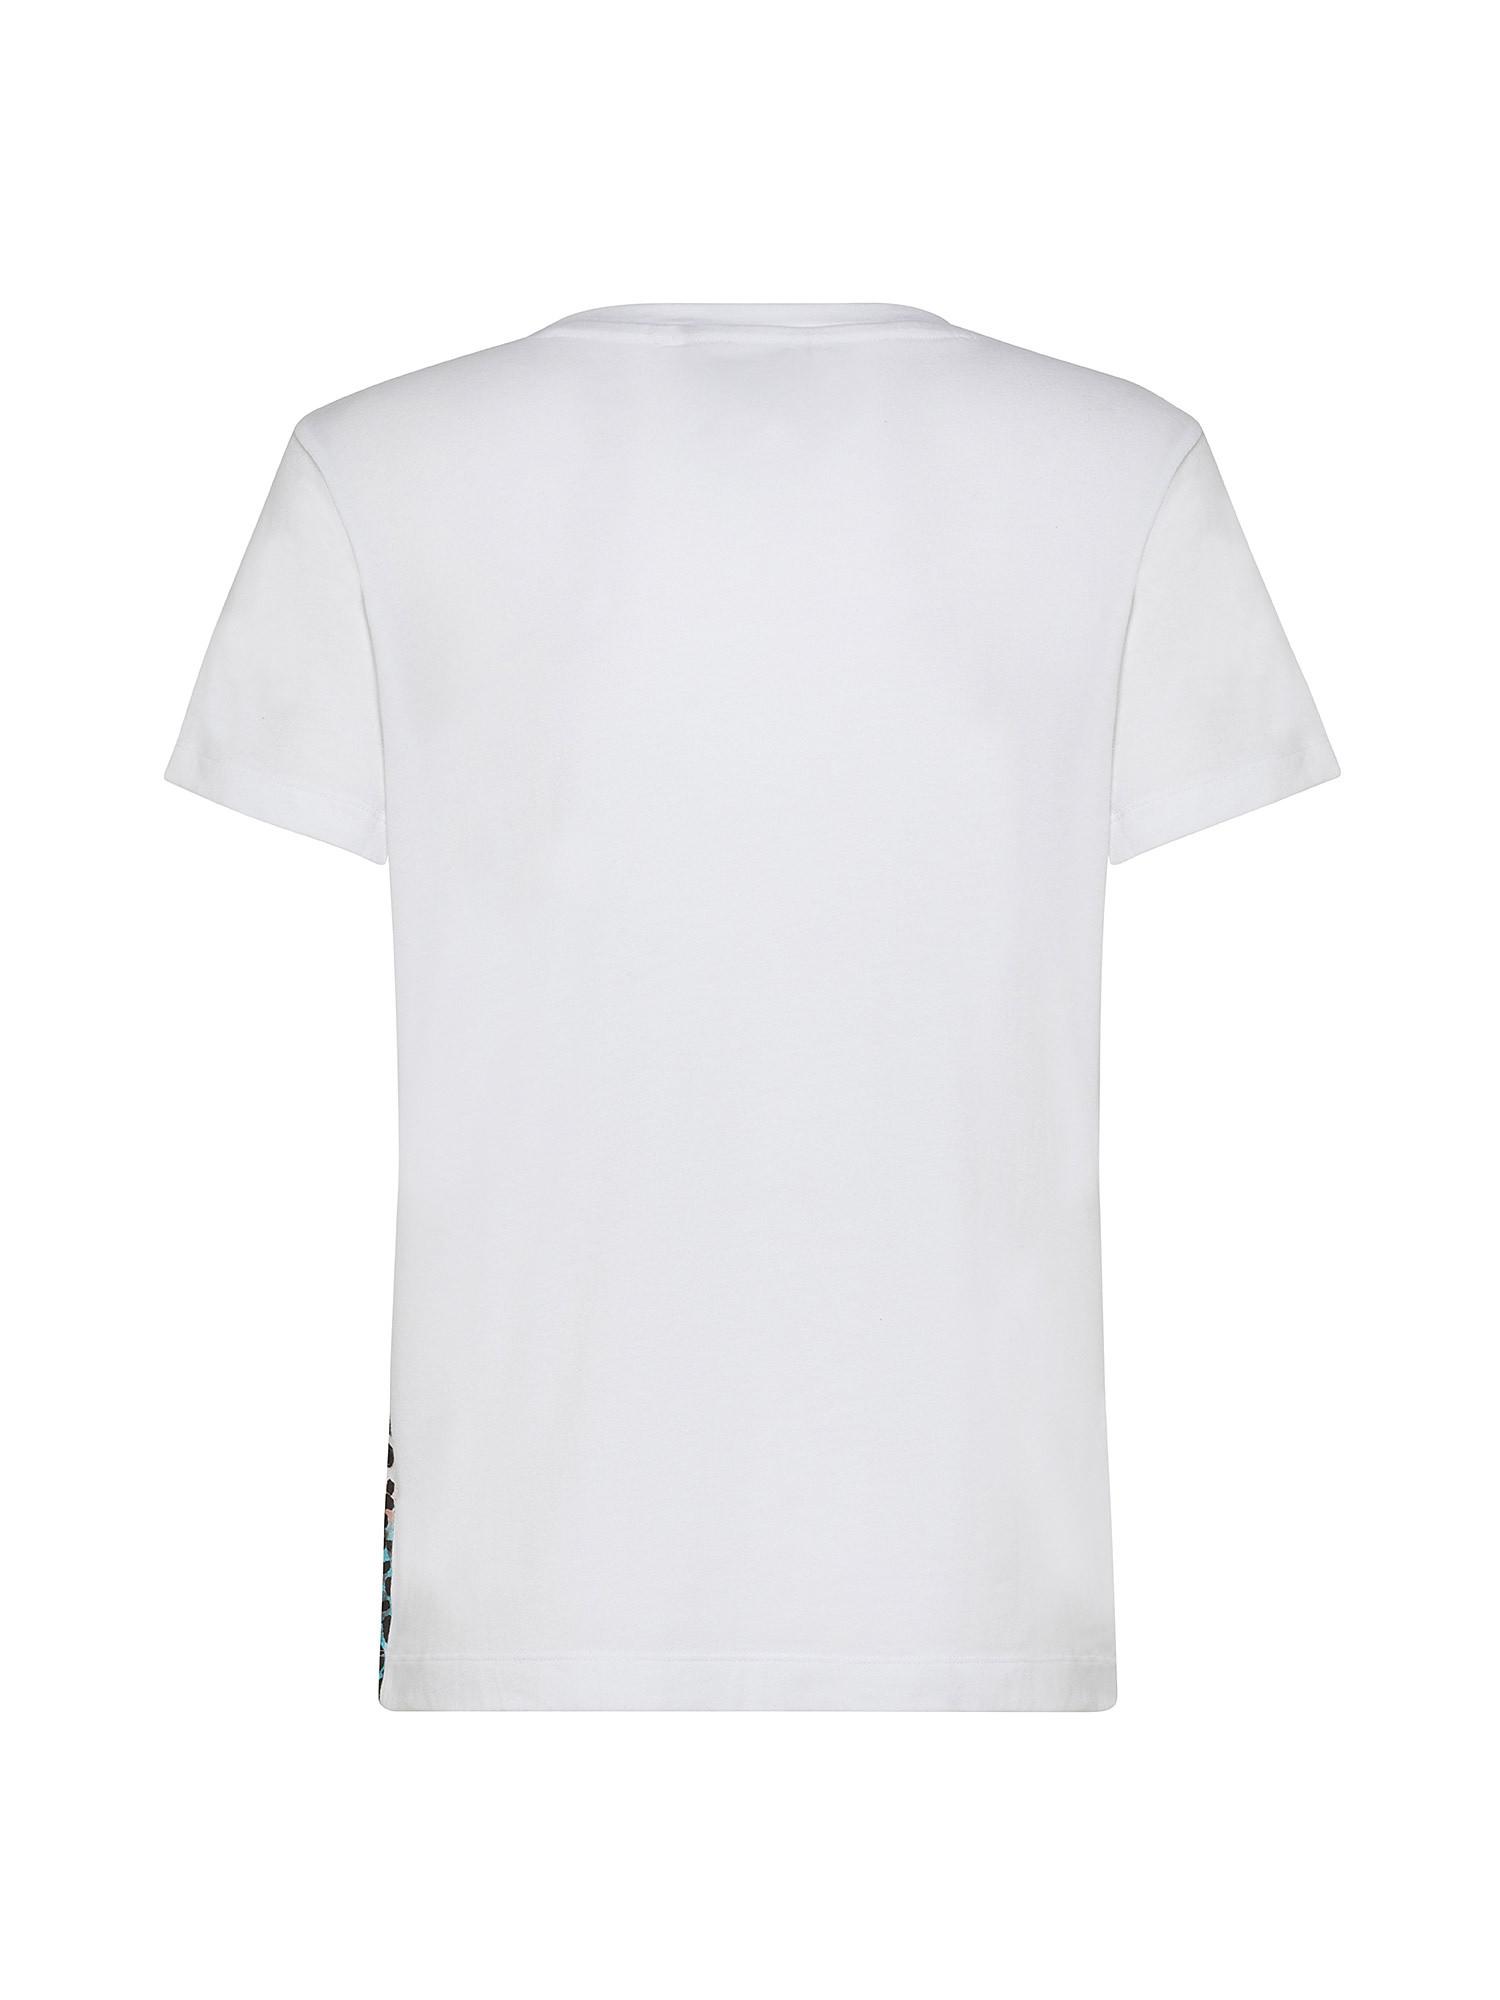 T-Shirt con logo leopardato, Bianco, large image number 1